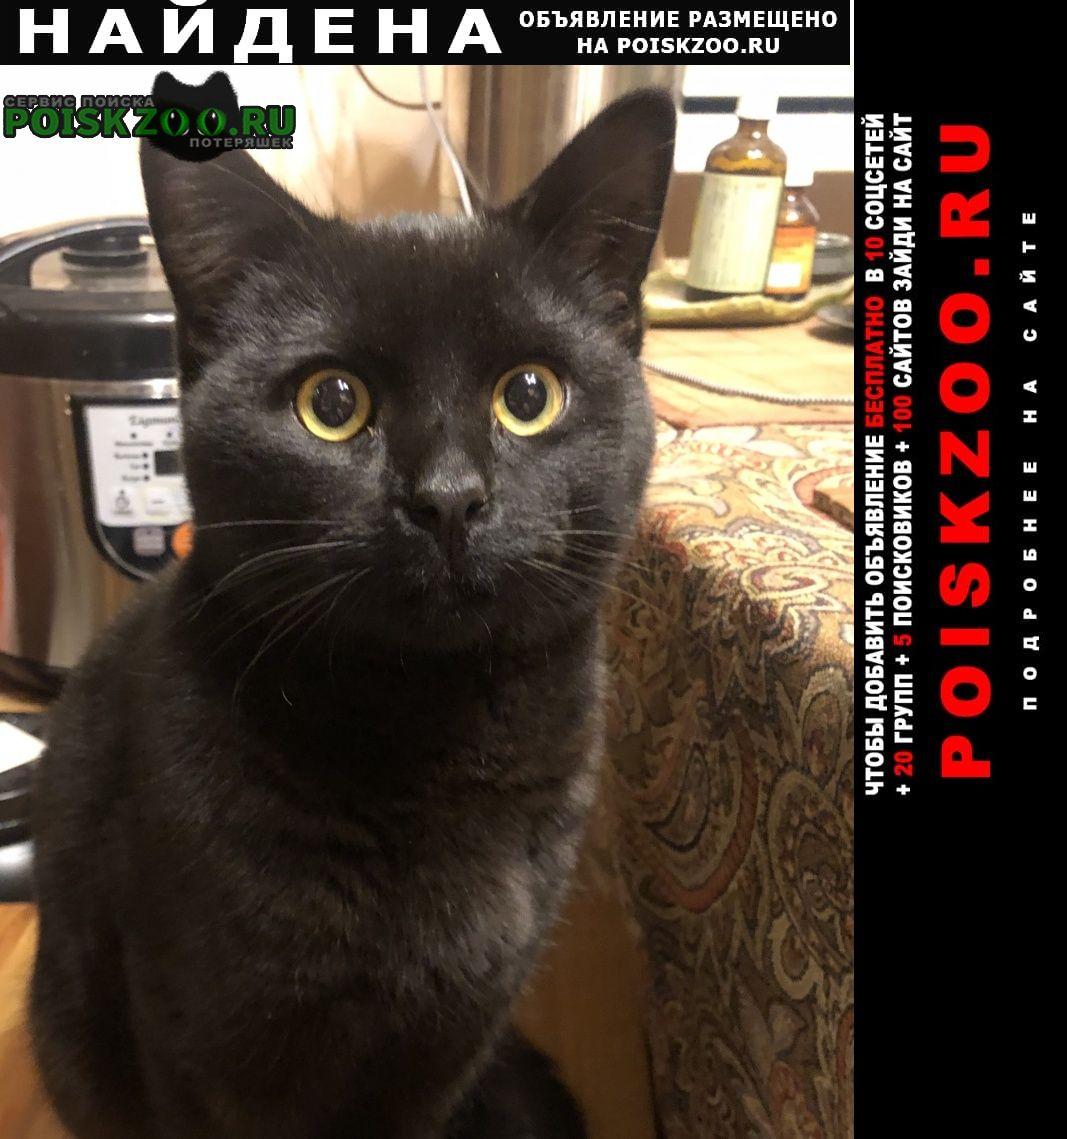 Найден кот чёрный короткошерстный Москва